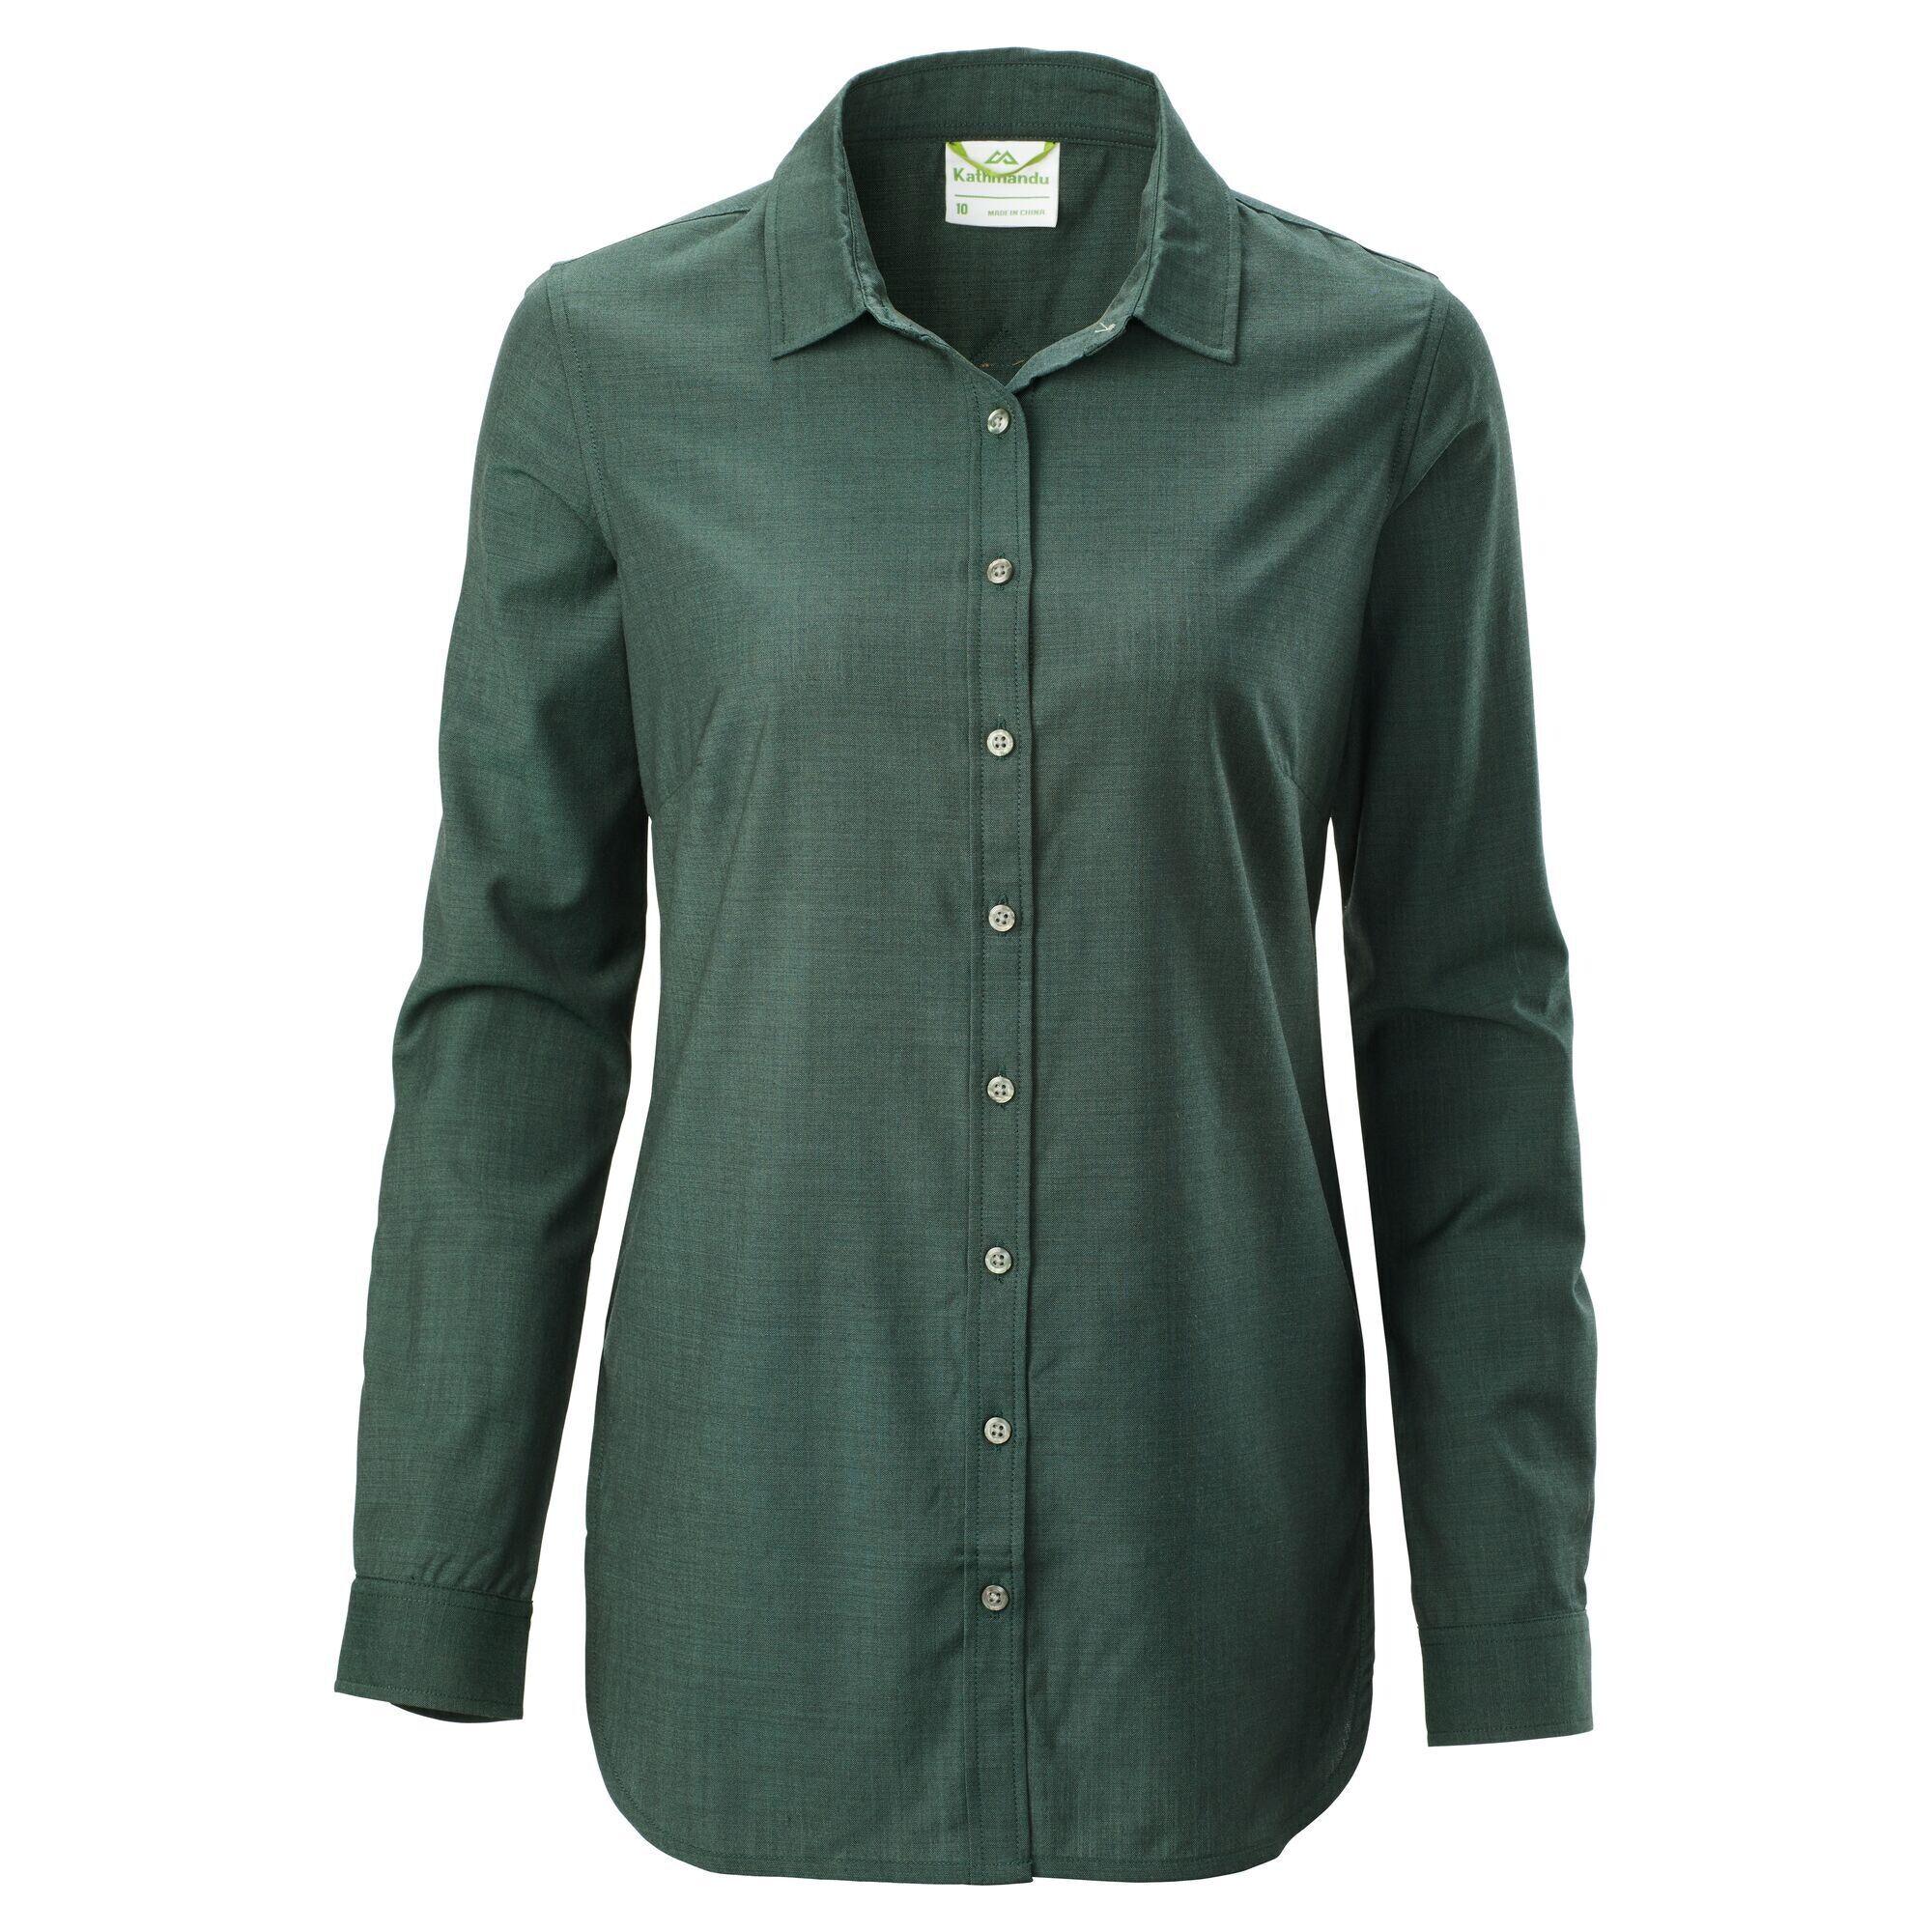 Kathmandu Tomar Women's Merino Long Sleeve Shirt  - Dark Spruce - Size: US 10